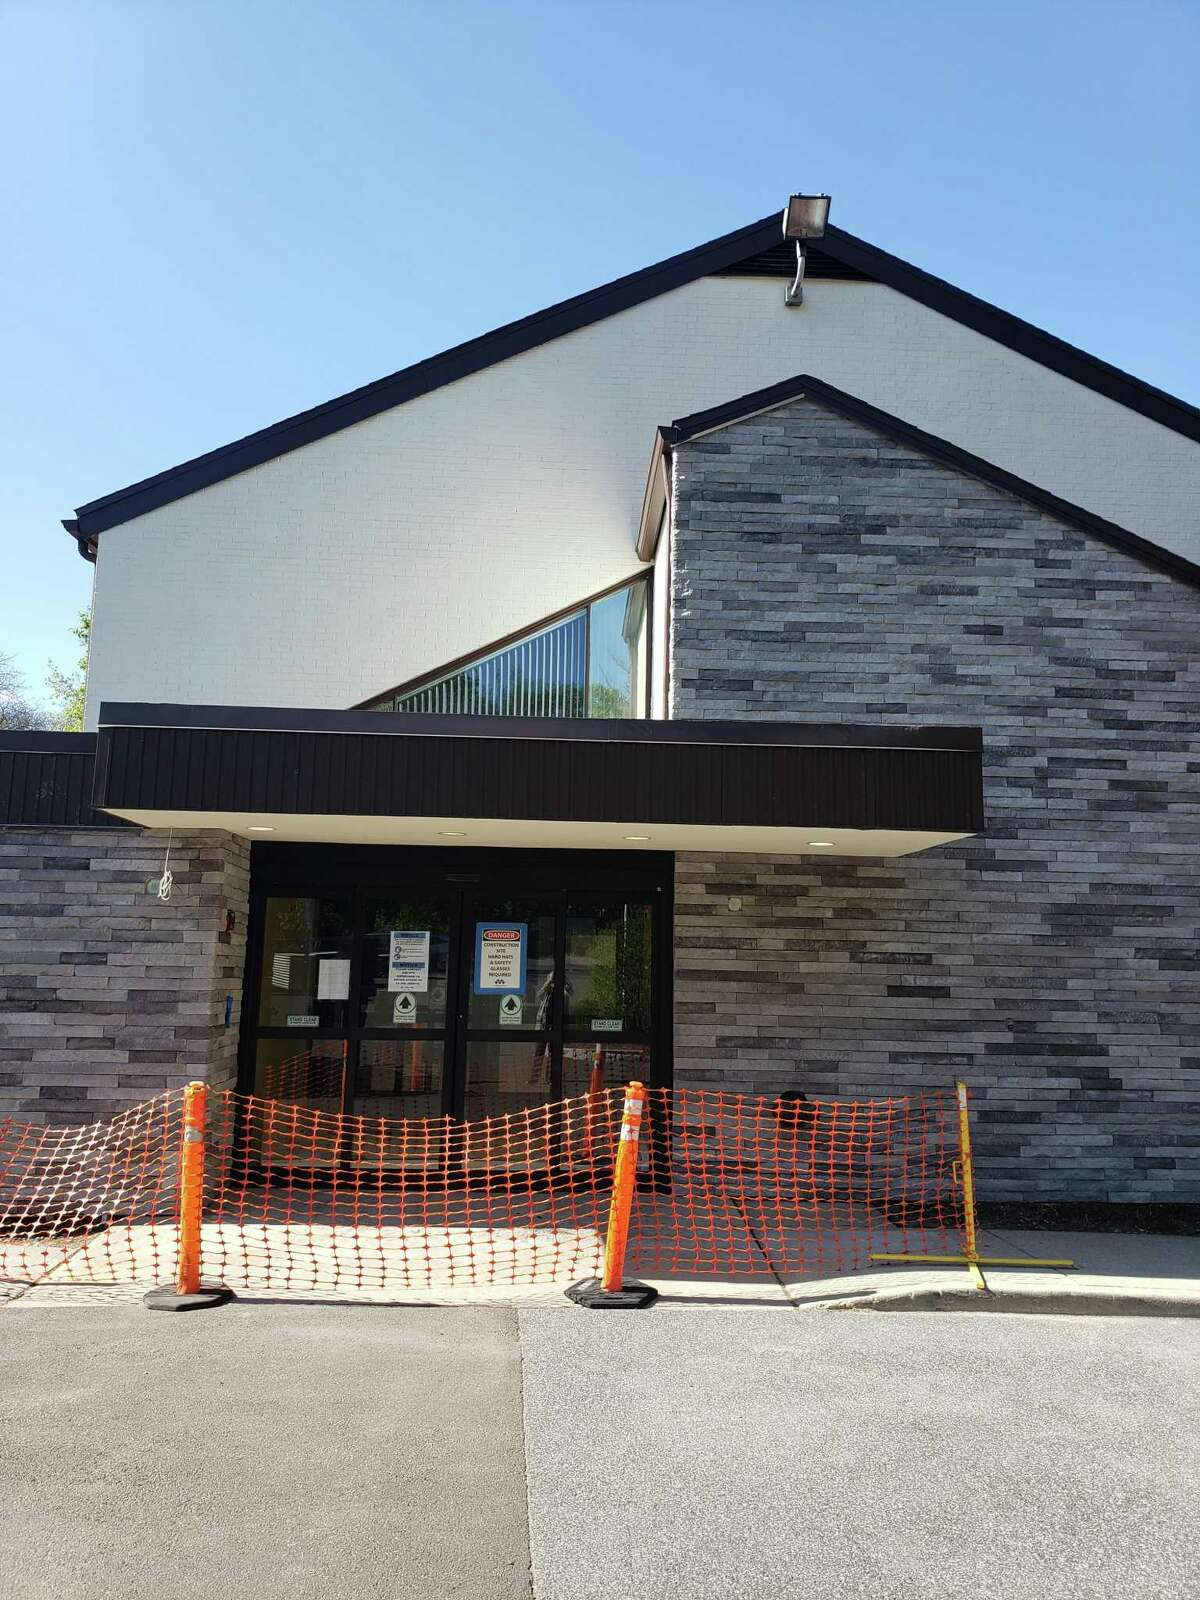 Waveny LifeCare Network had begun renovations on The Inn.